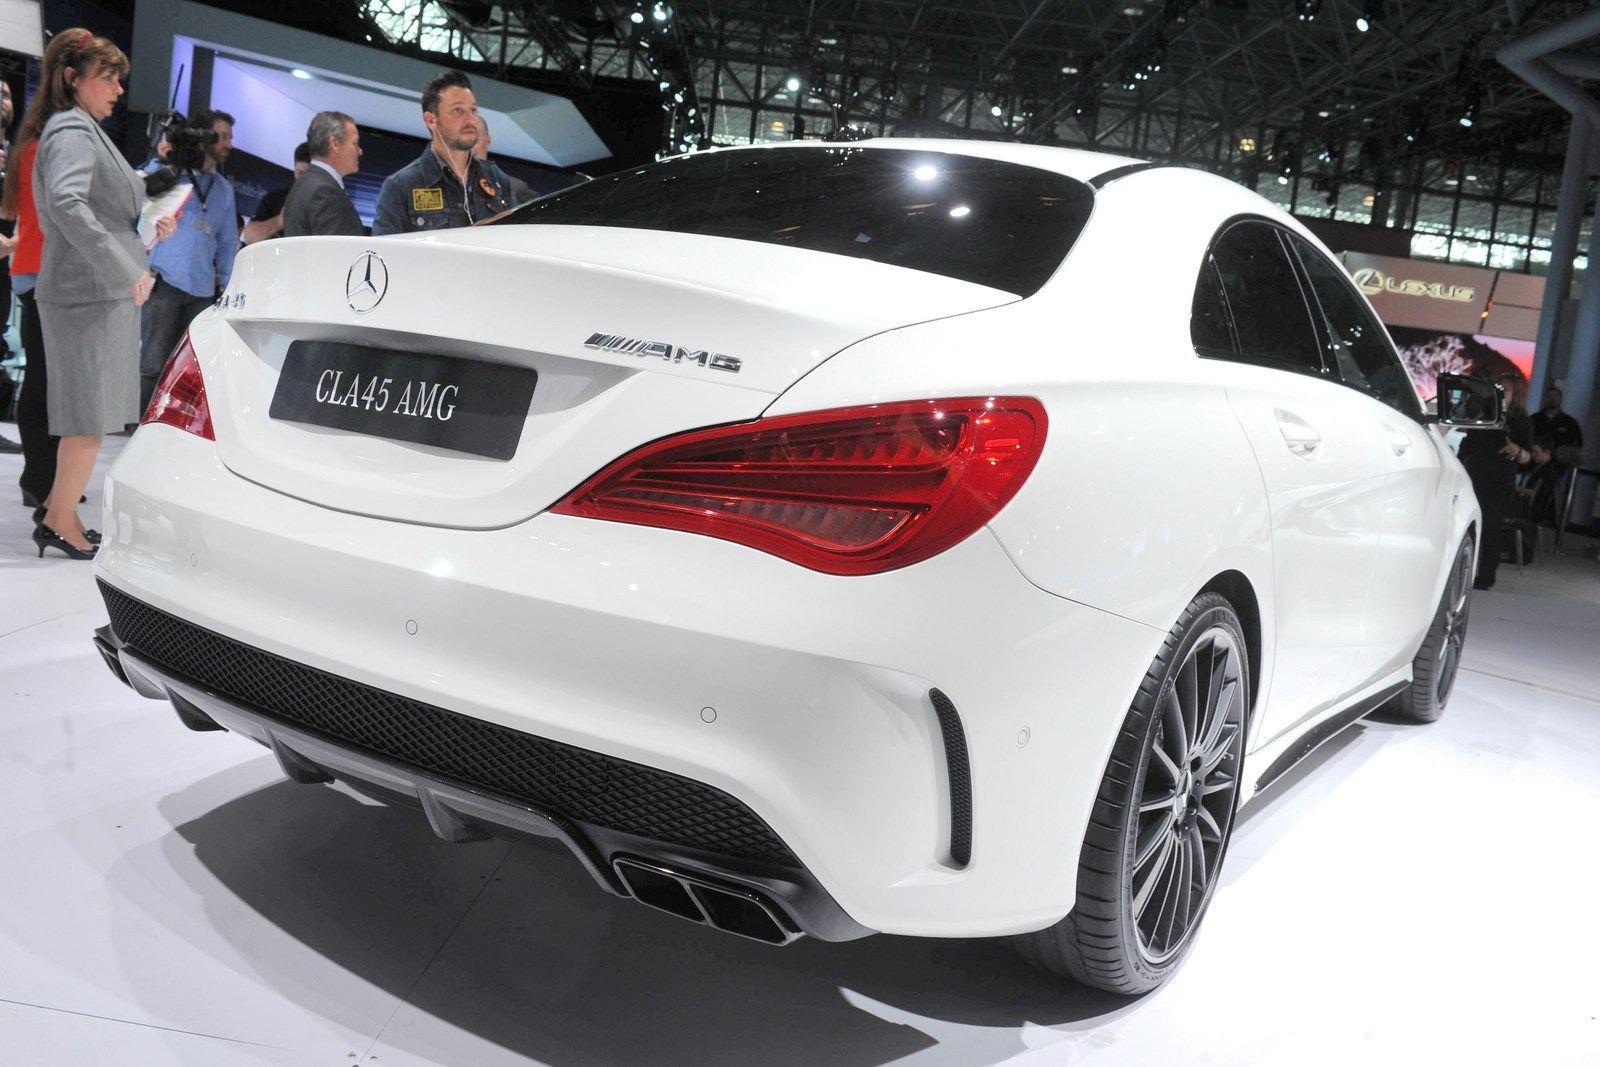 Mercedes-Benz CLA 45 AMG